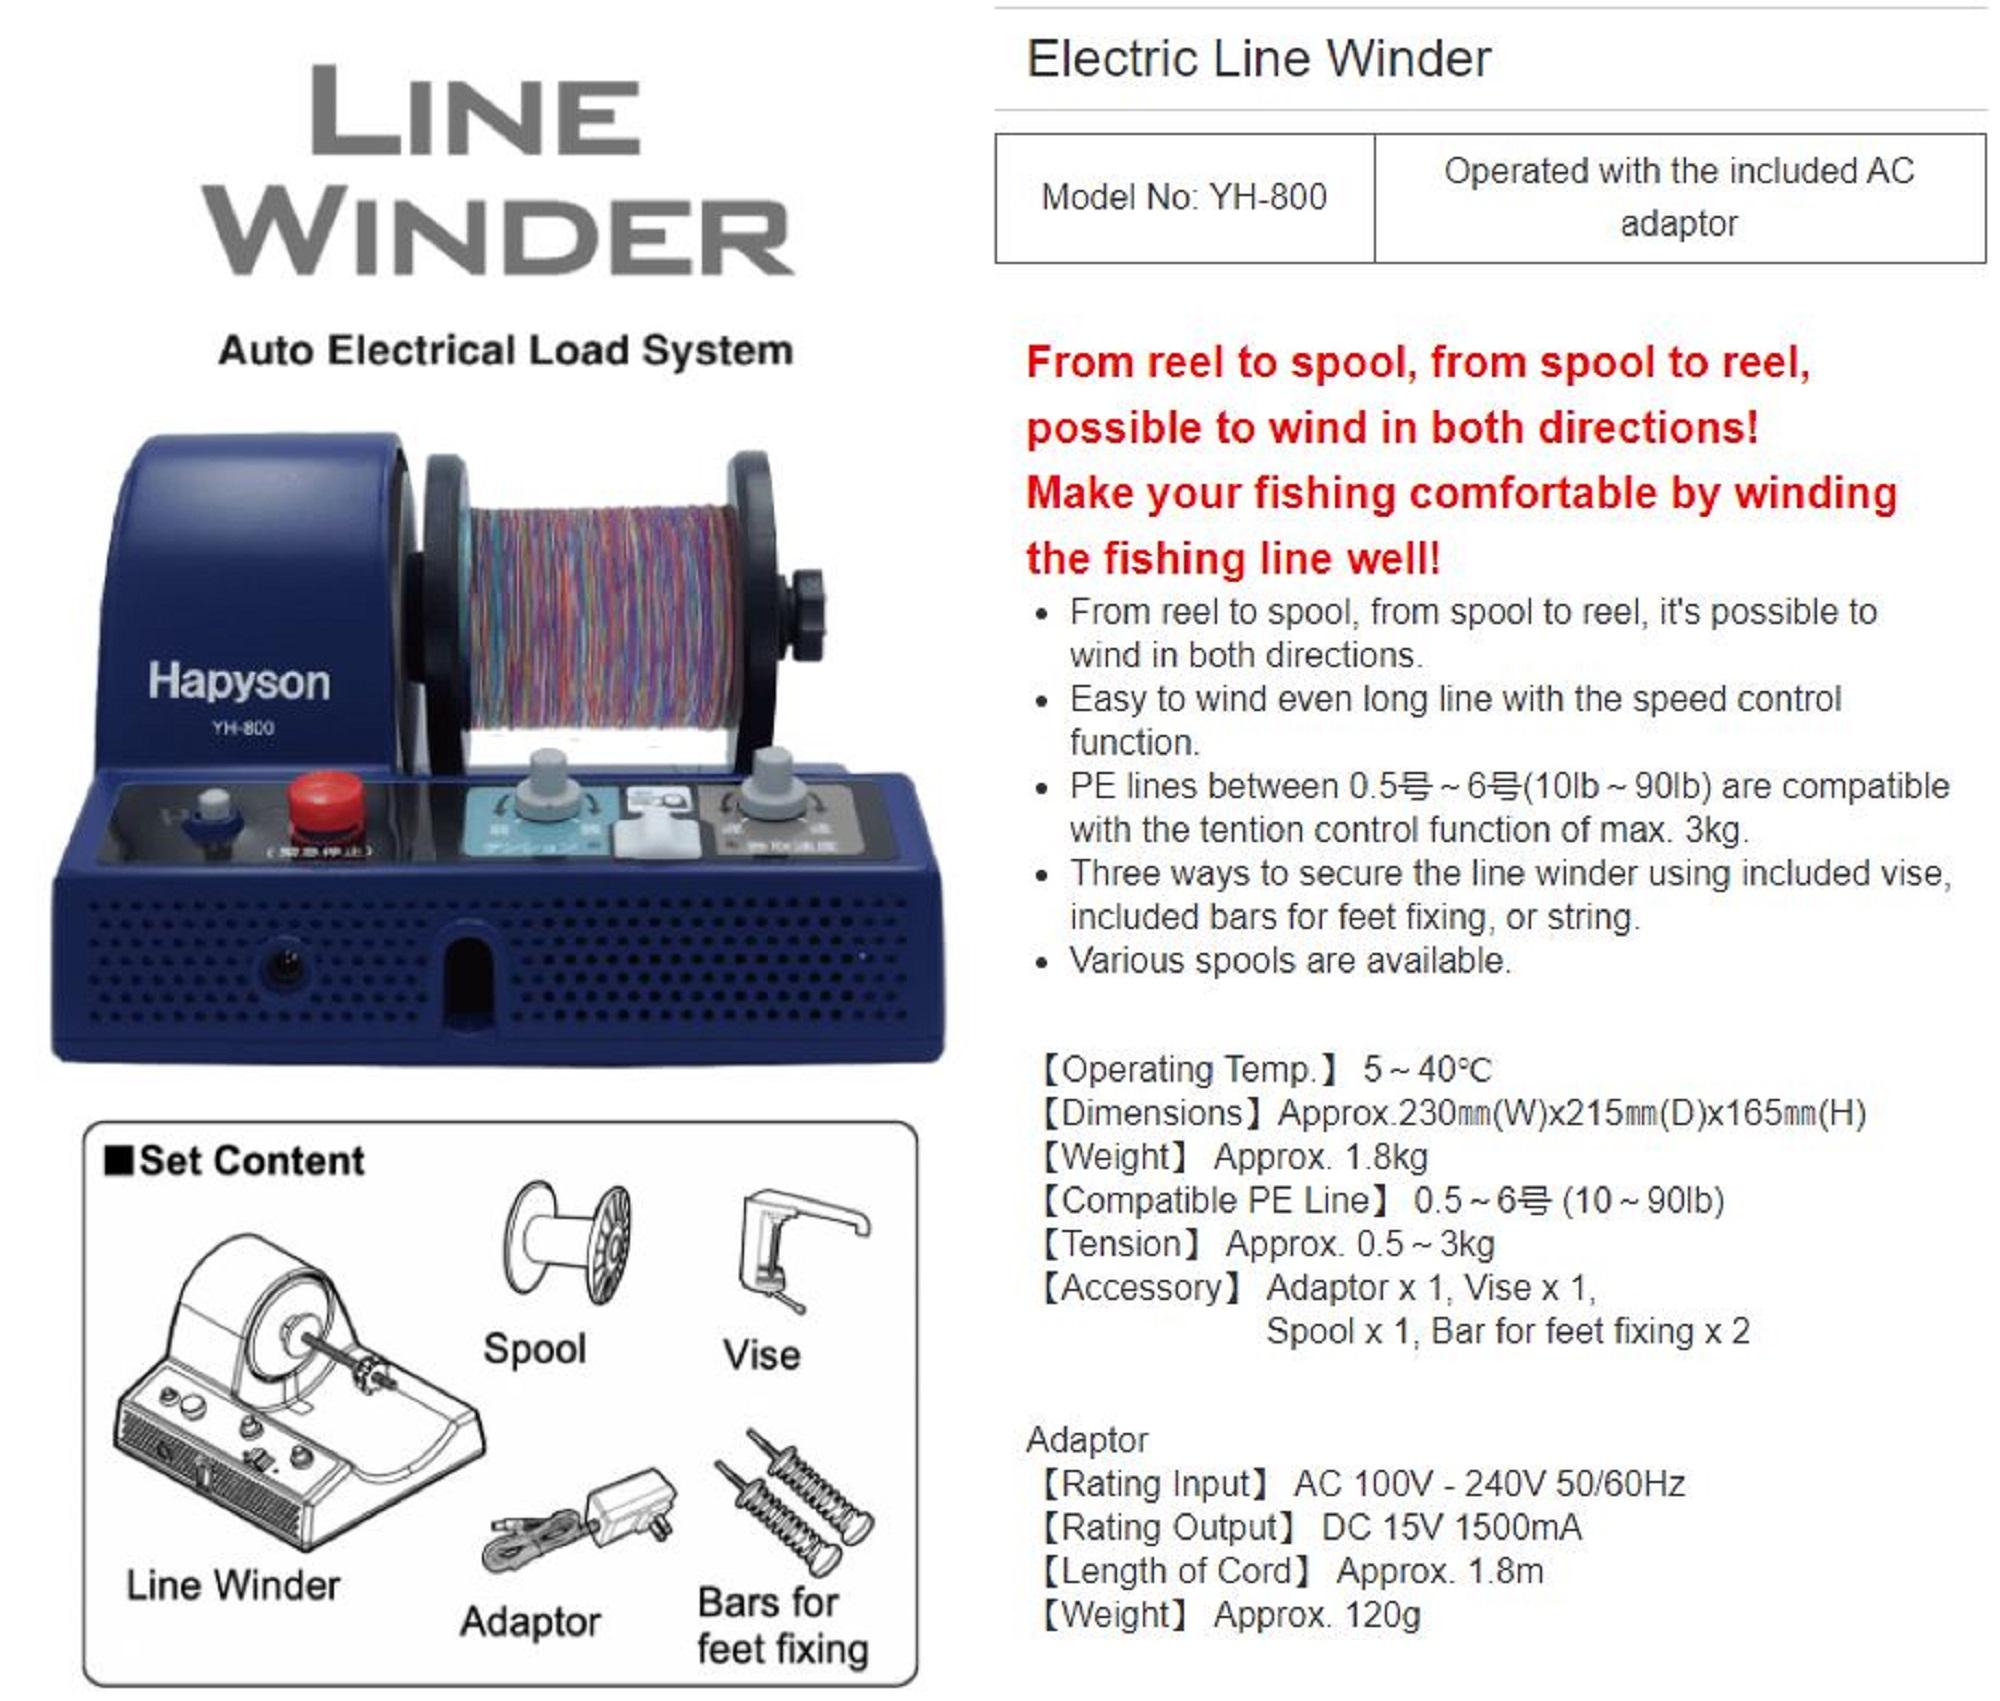 Hapyson YH-800 Line Winder Electric (3222)